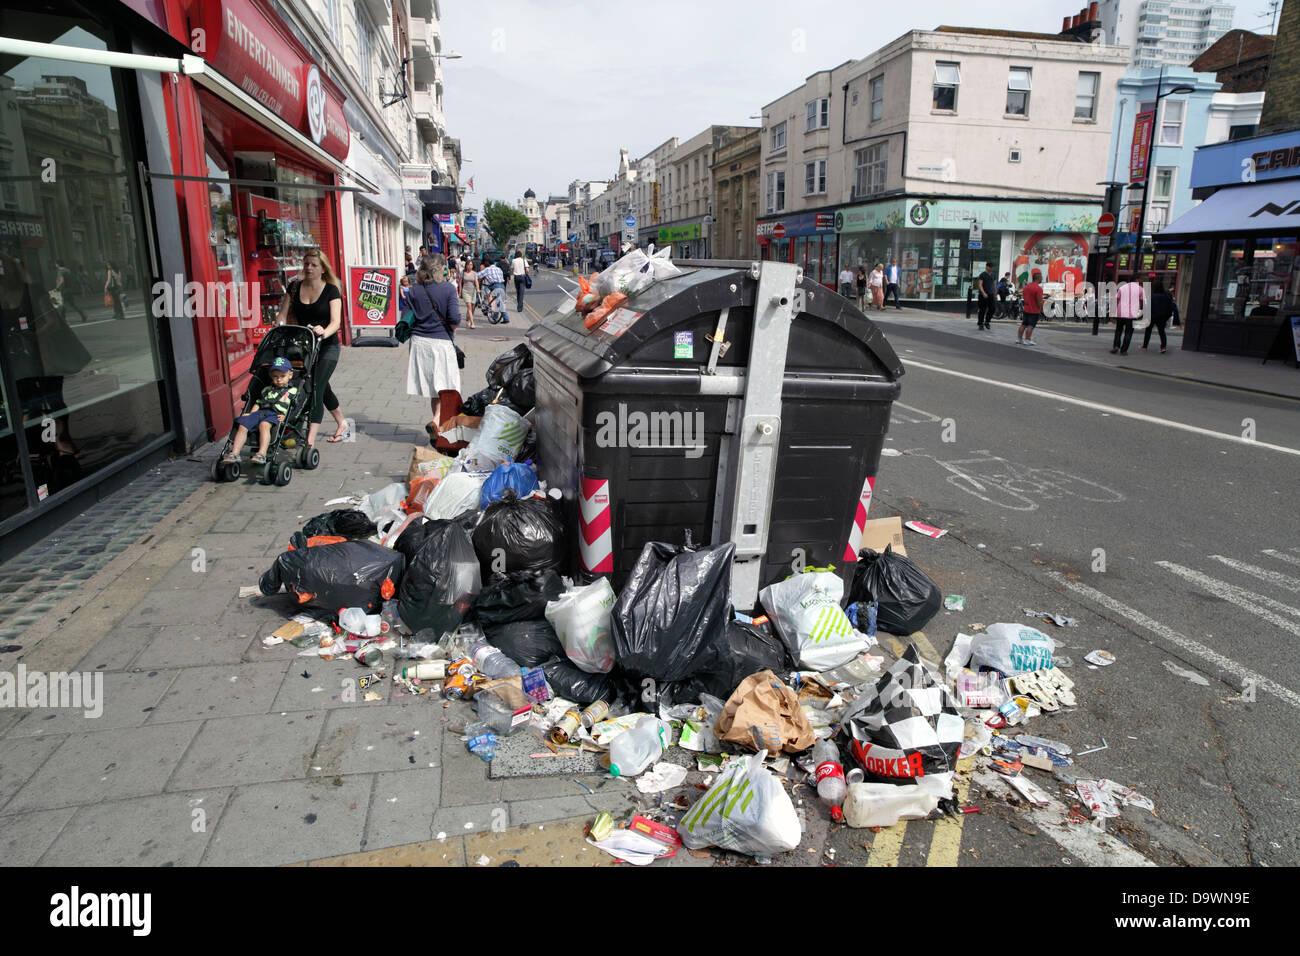 Piles of rubbish around a communal waste bin, Brighton city centre. - Stock Image